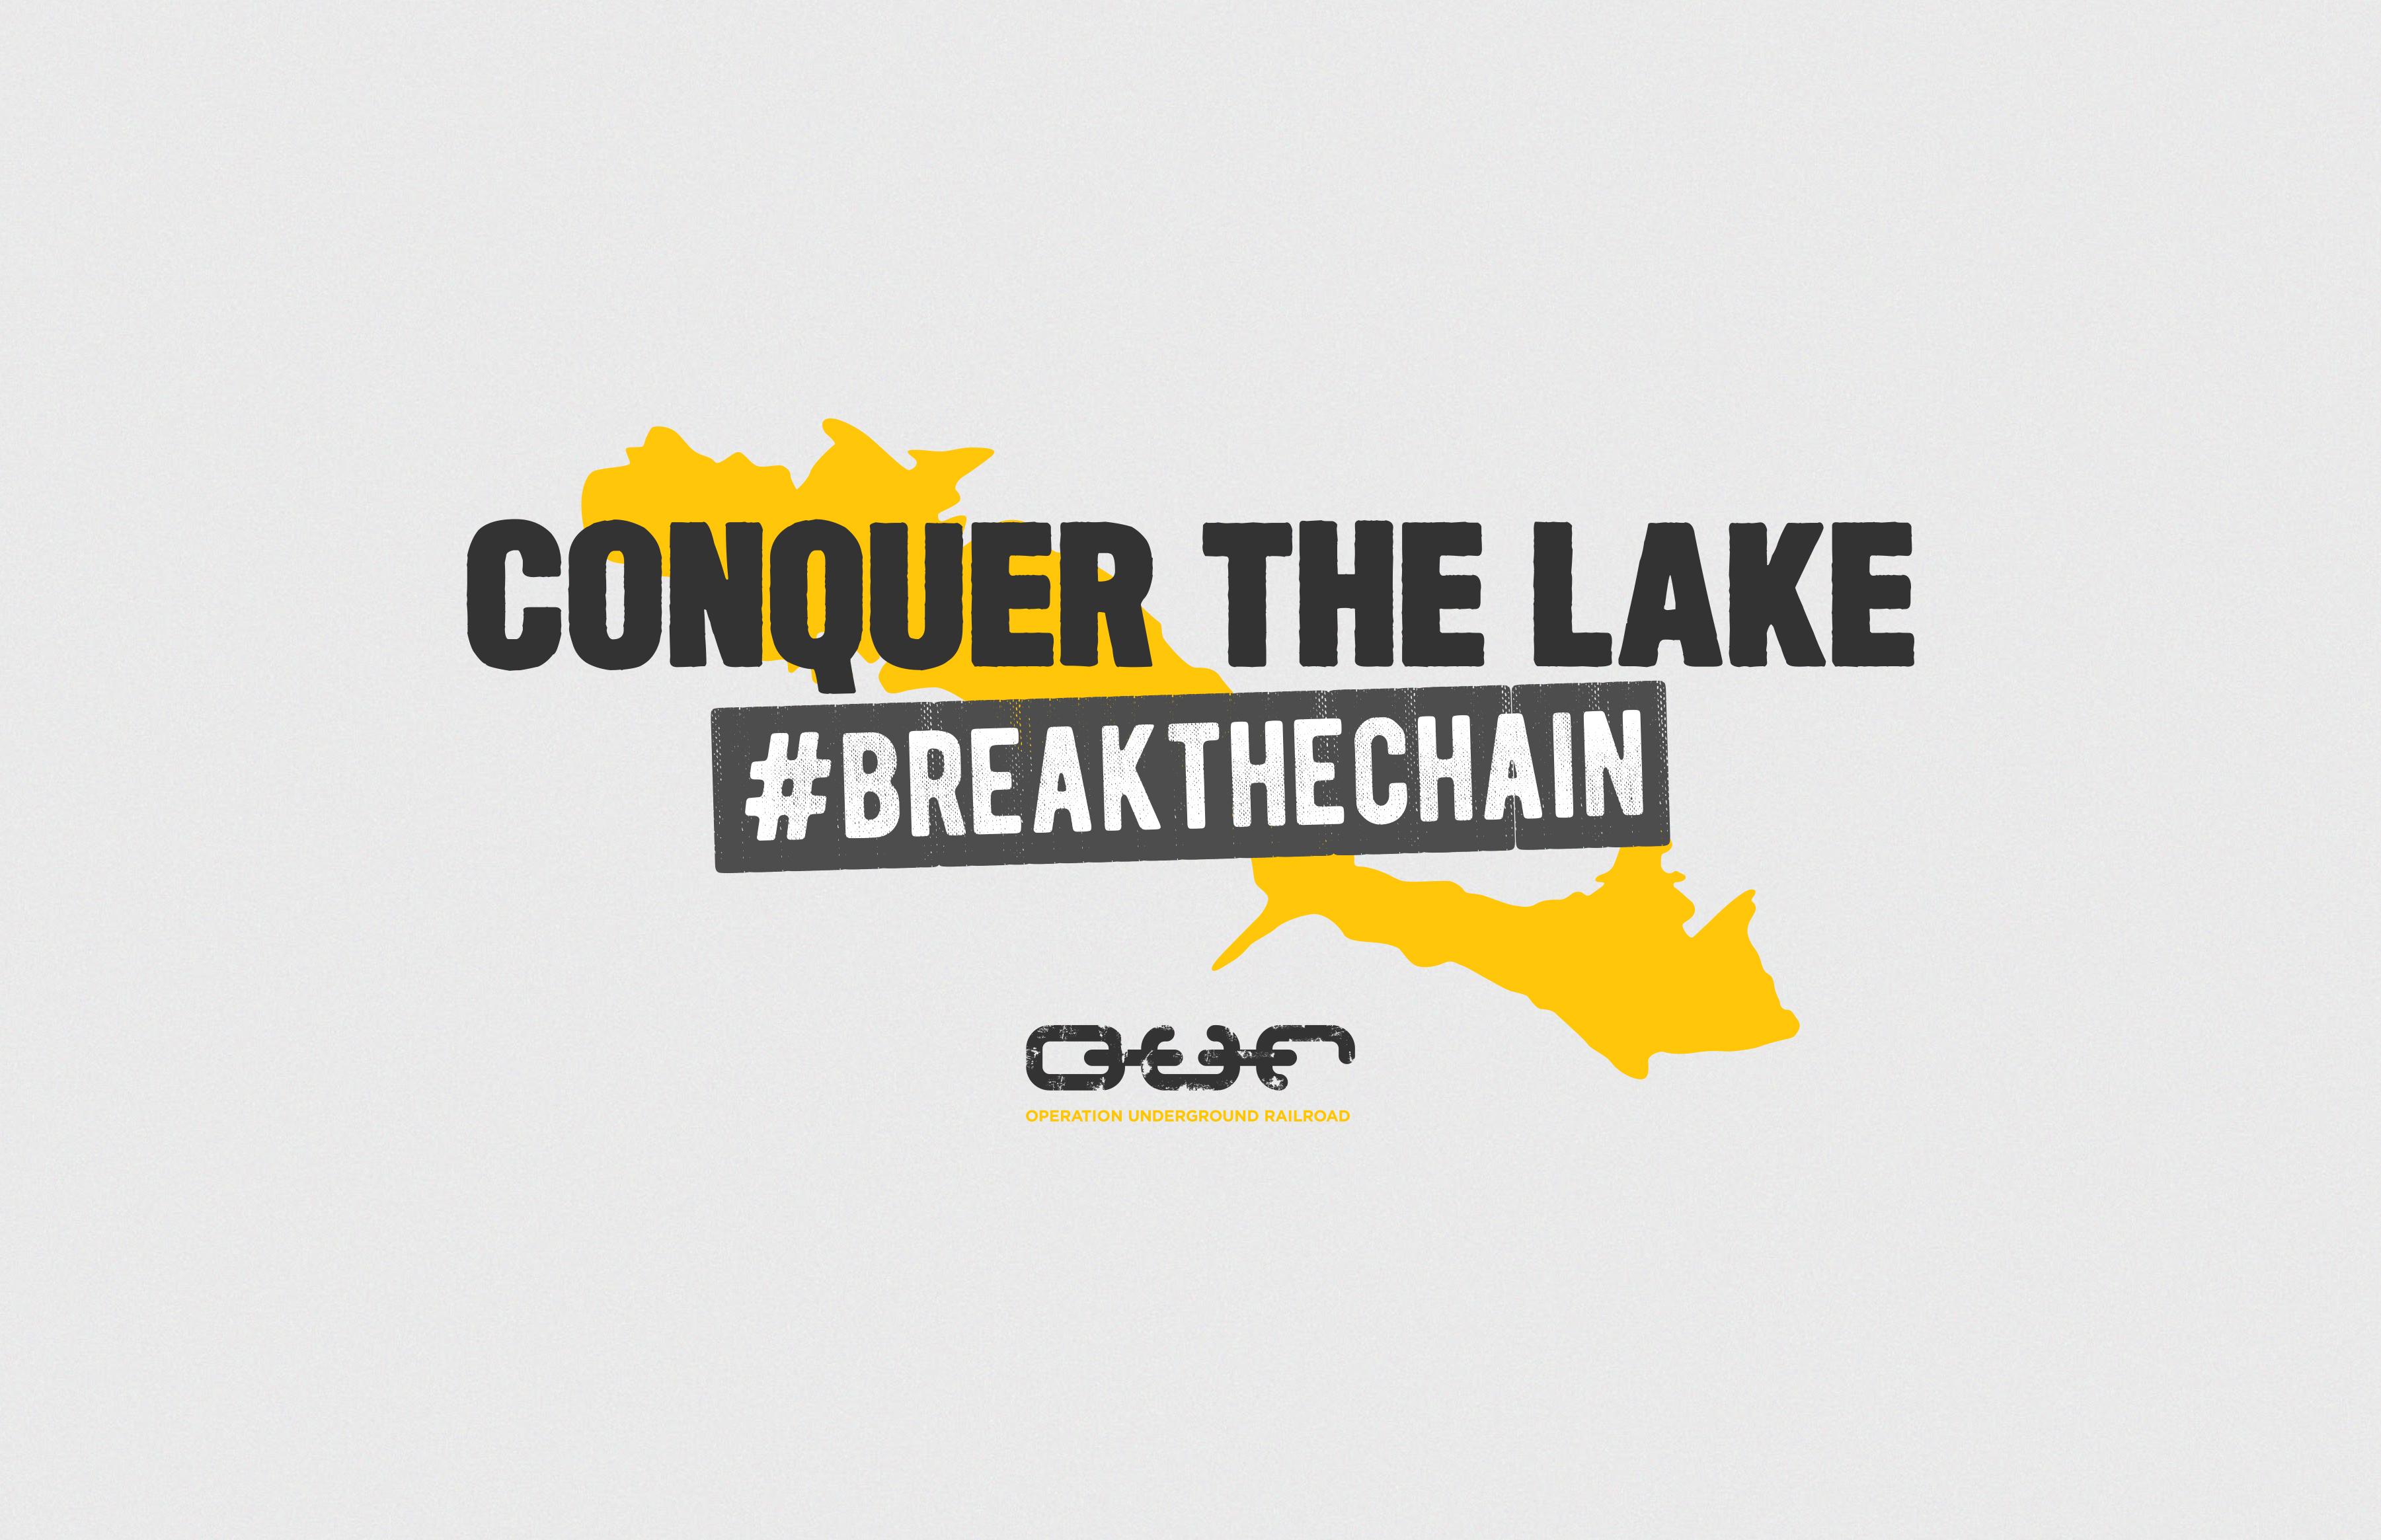 ConquerTheLake Marathon · OUR